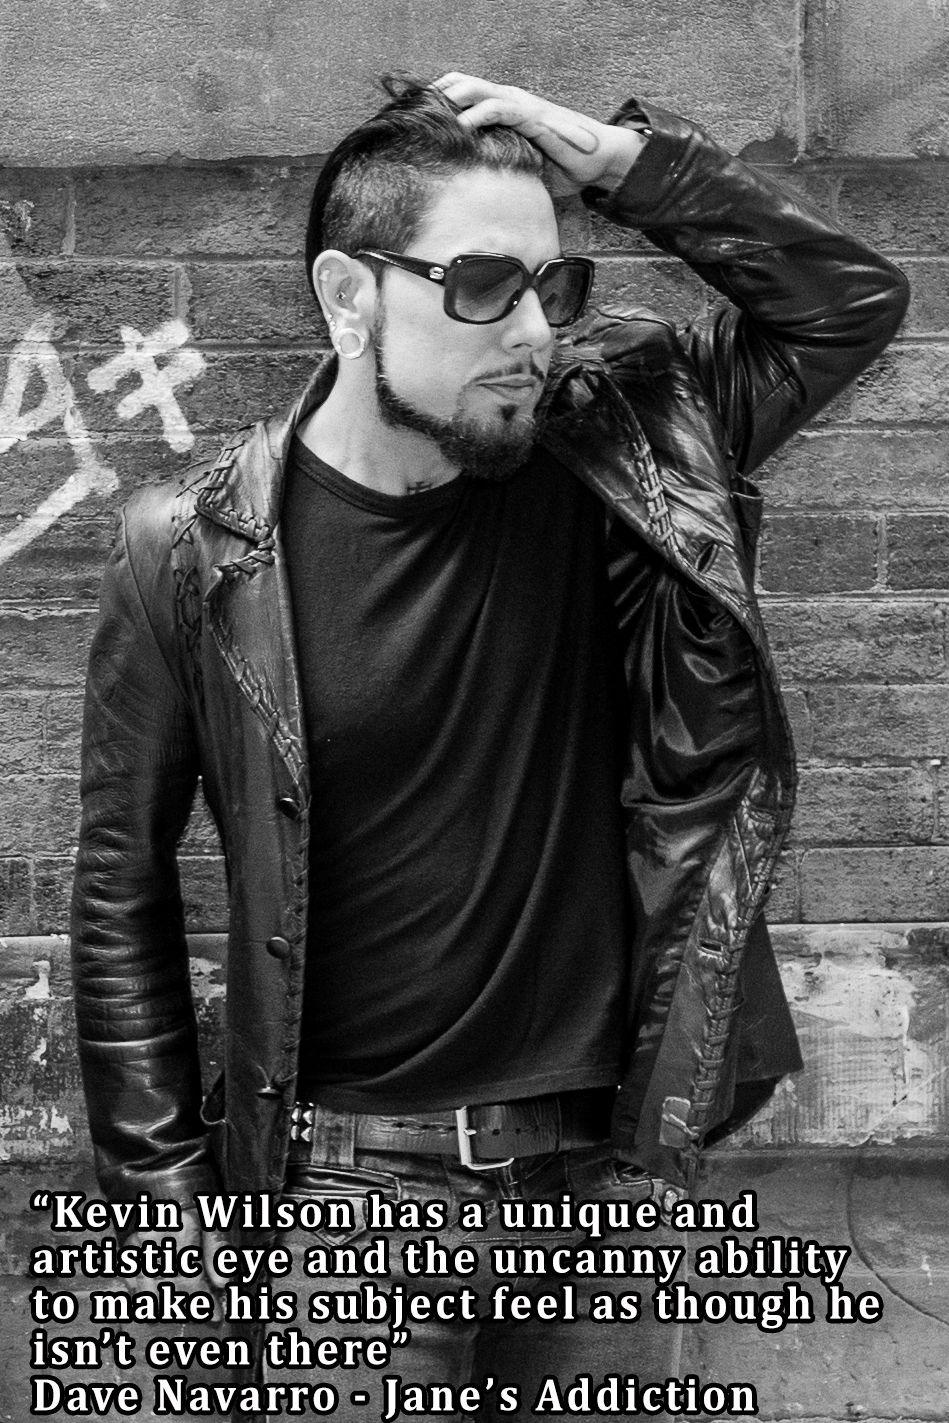 Dave Navarro - Jane's Addiction